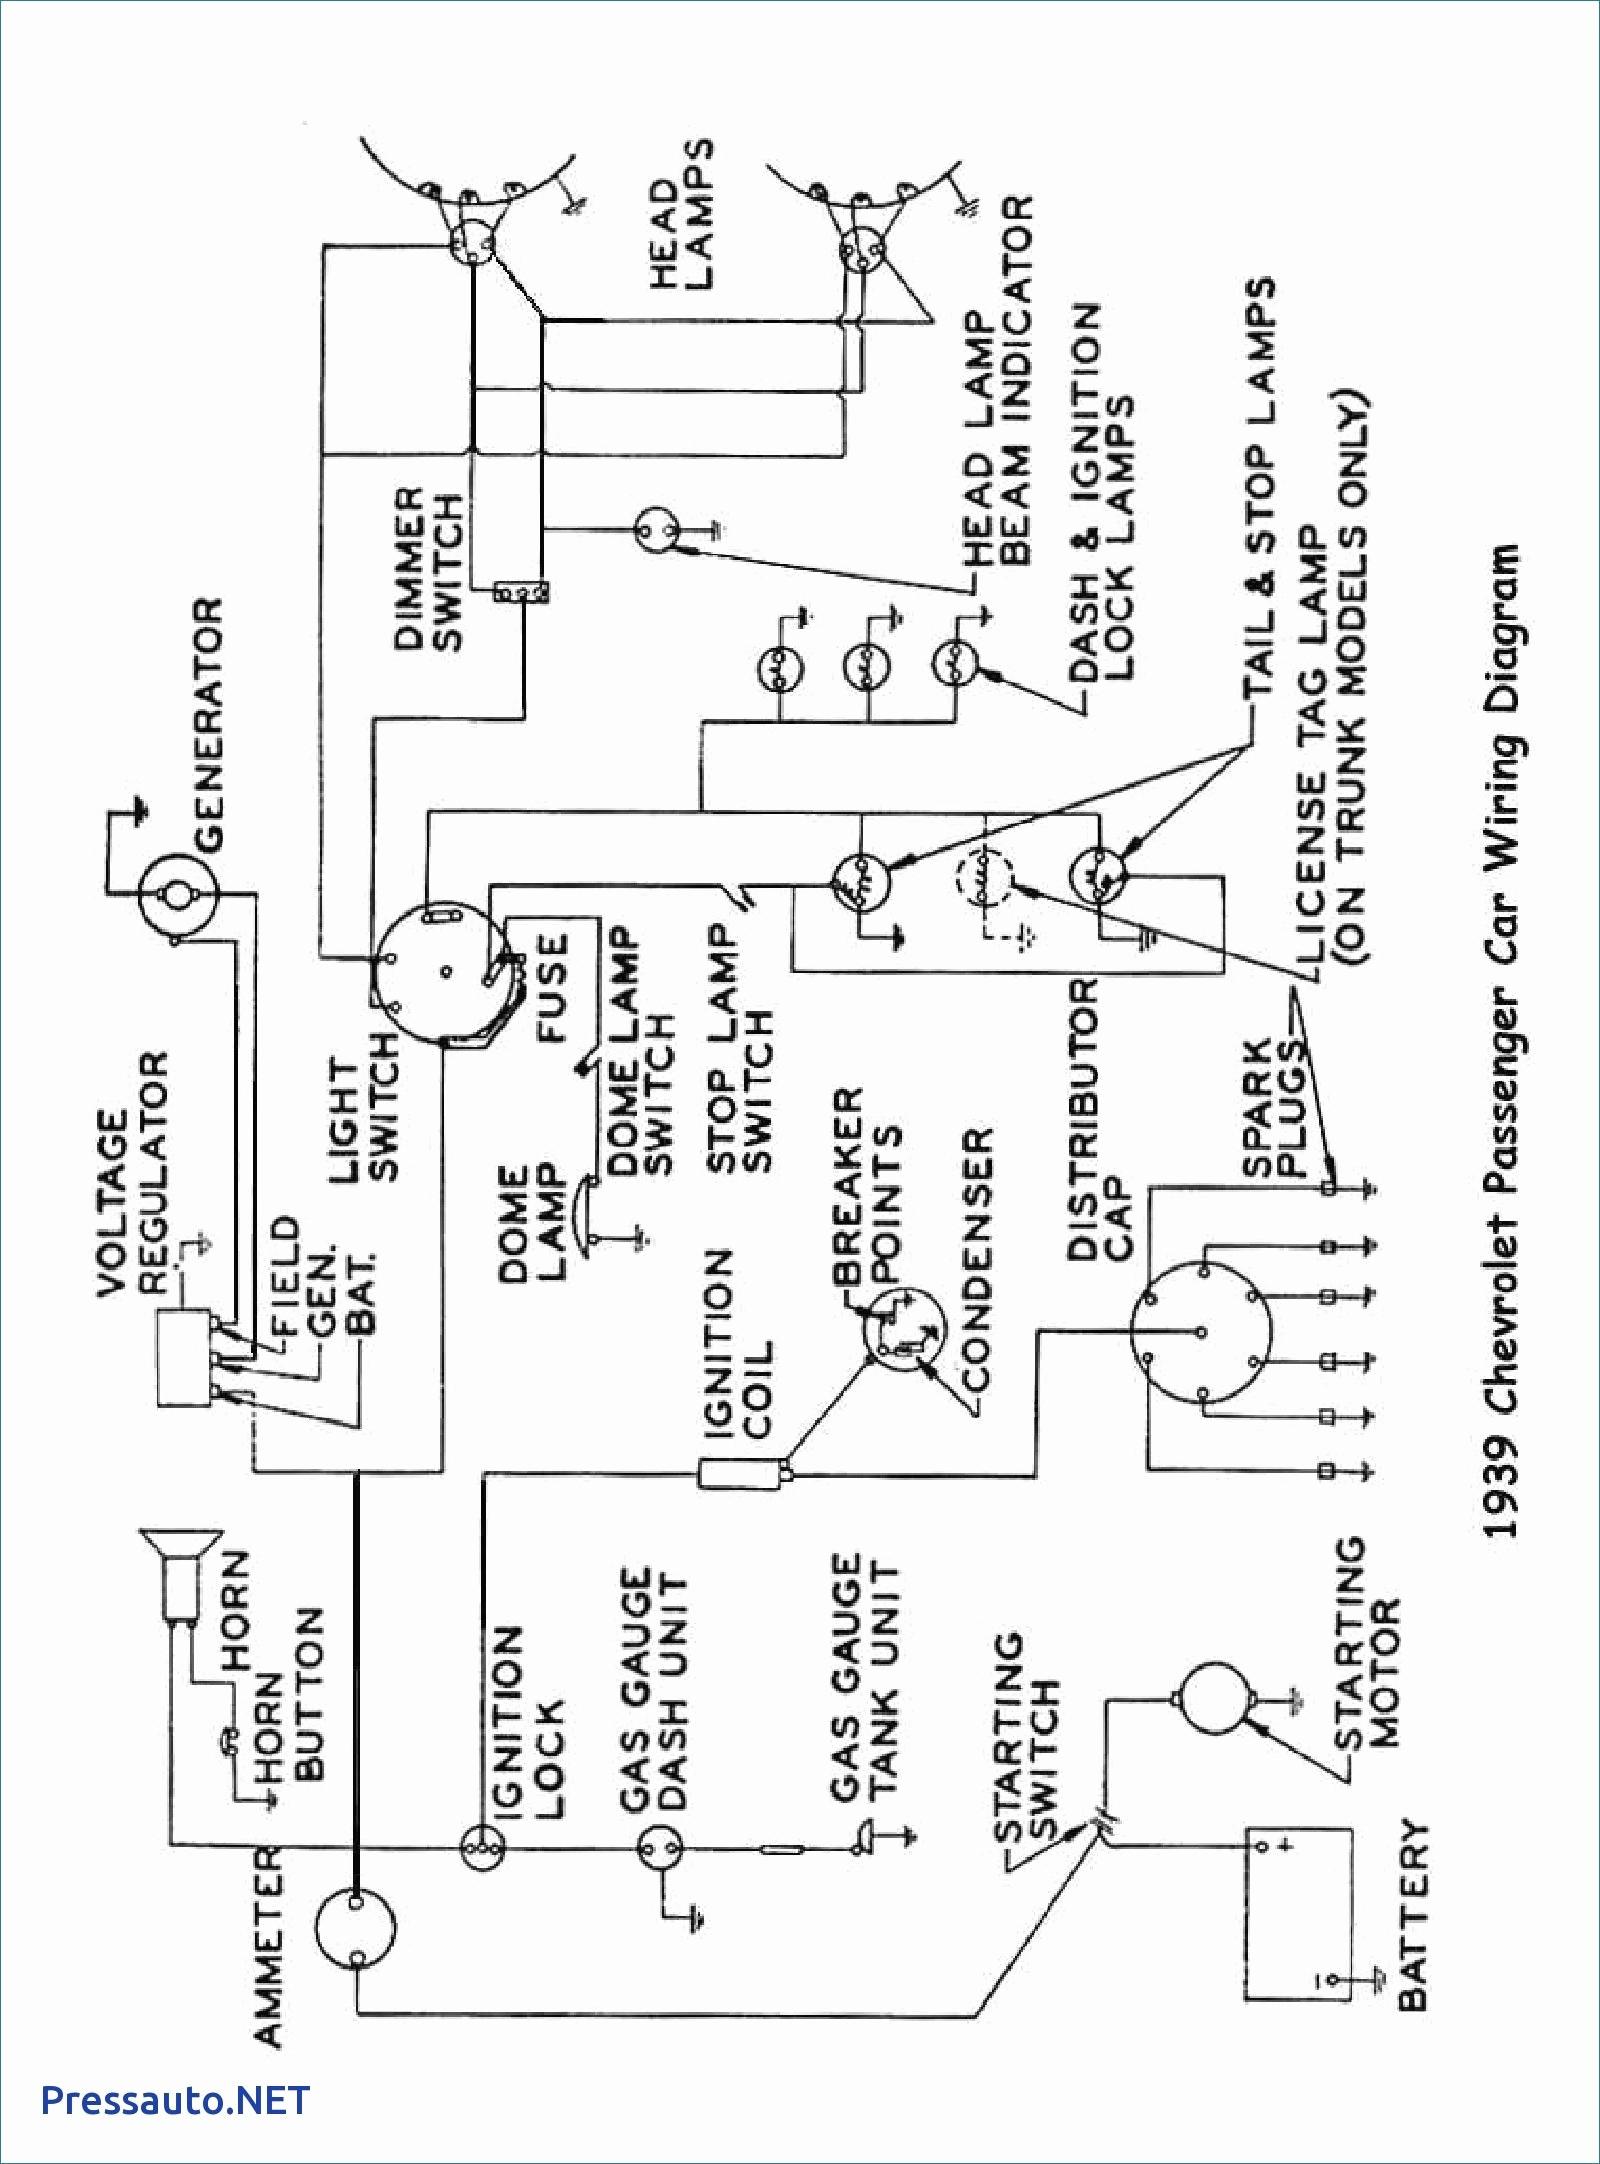 hight resolution of international 4700 wiring diagram headlights wiring library international 4700 wiring diagram pdf